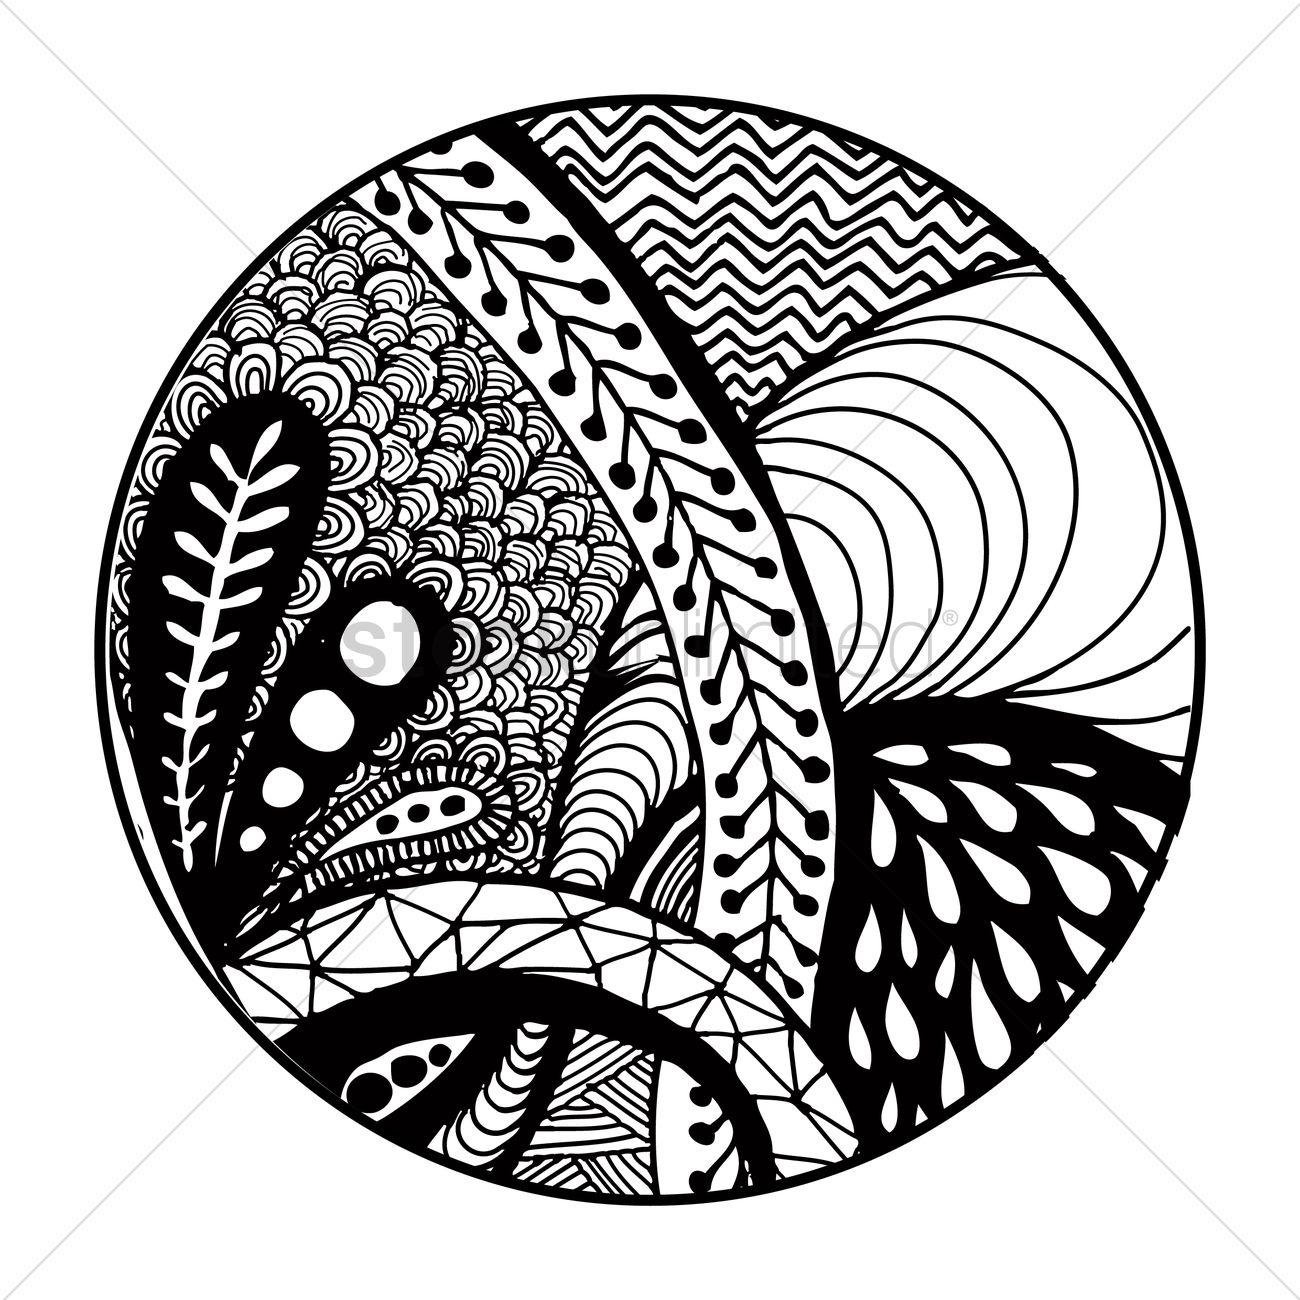 1300x1300 Decorative Pattern Design Vector Image